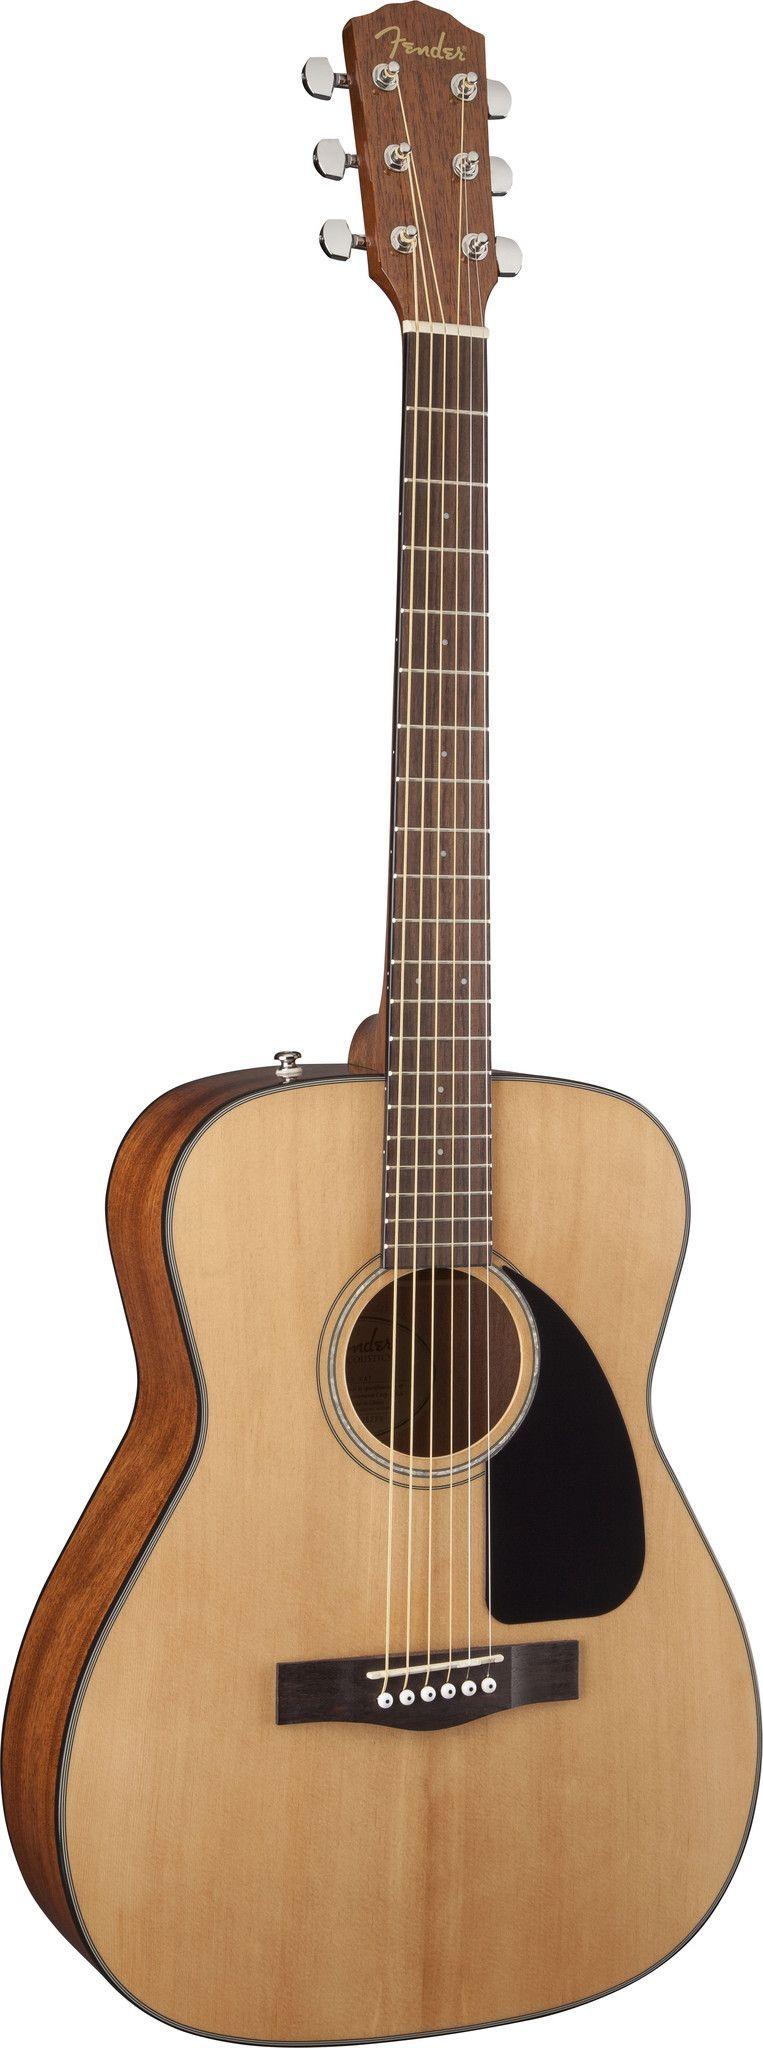 Fender Cf 60 Folk Learn Acoustic Guitar Acoustic Guitar Fender Acoustic